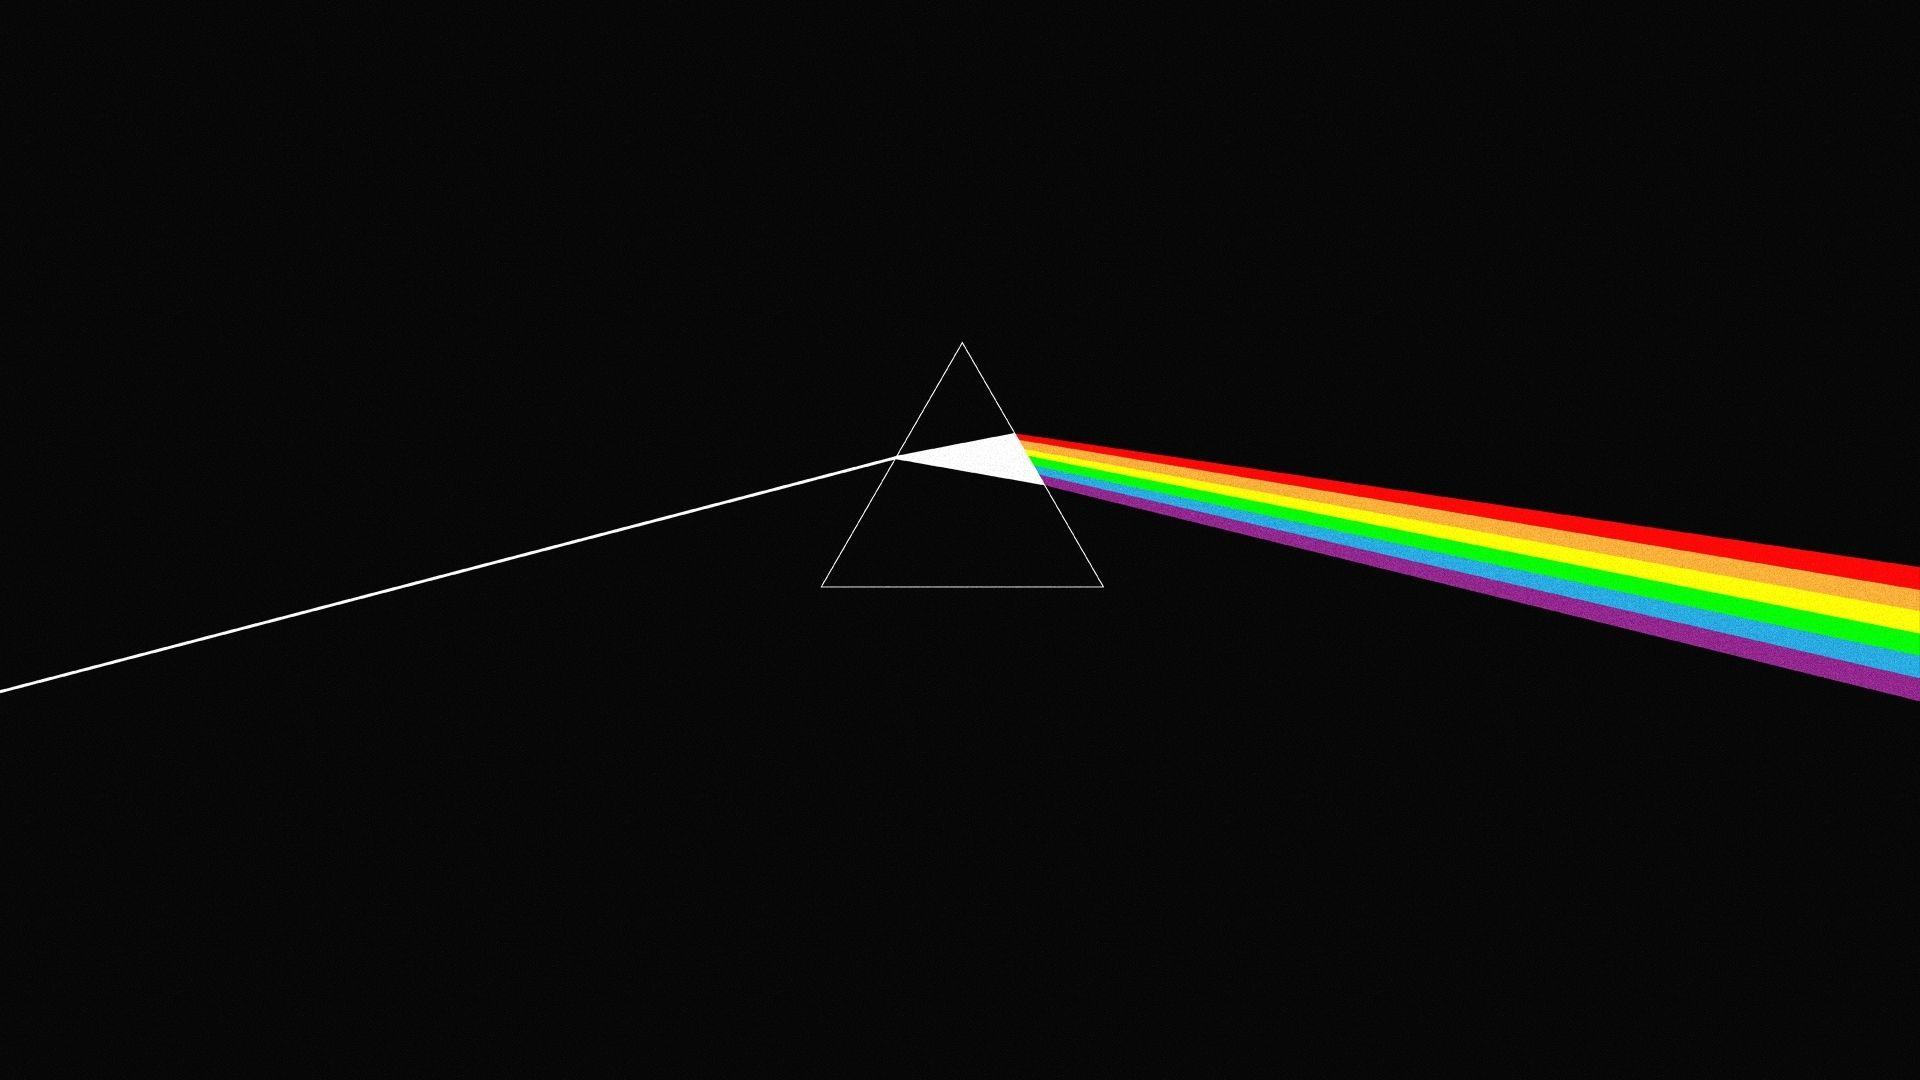 Pink Floyd Hd Wallpaper Desktop Beraplan Com Pink Floyd Wallpaper Pink Floyd Images Pink Floyd